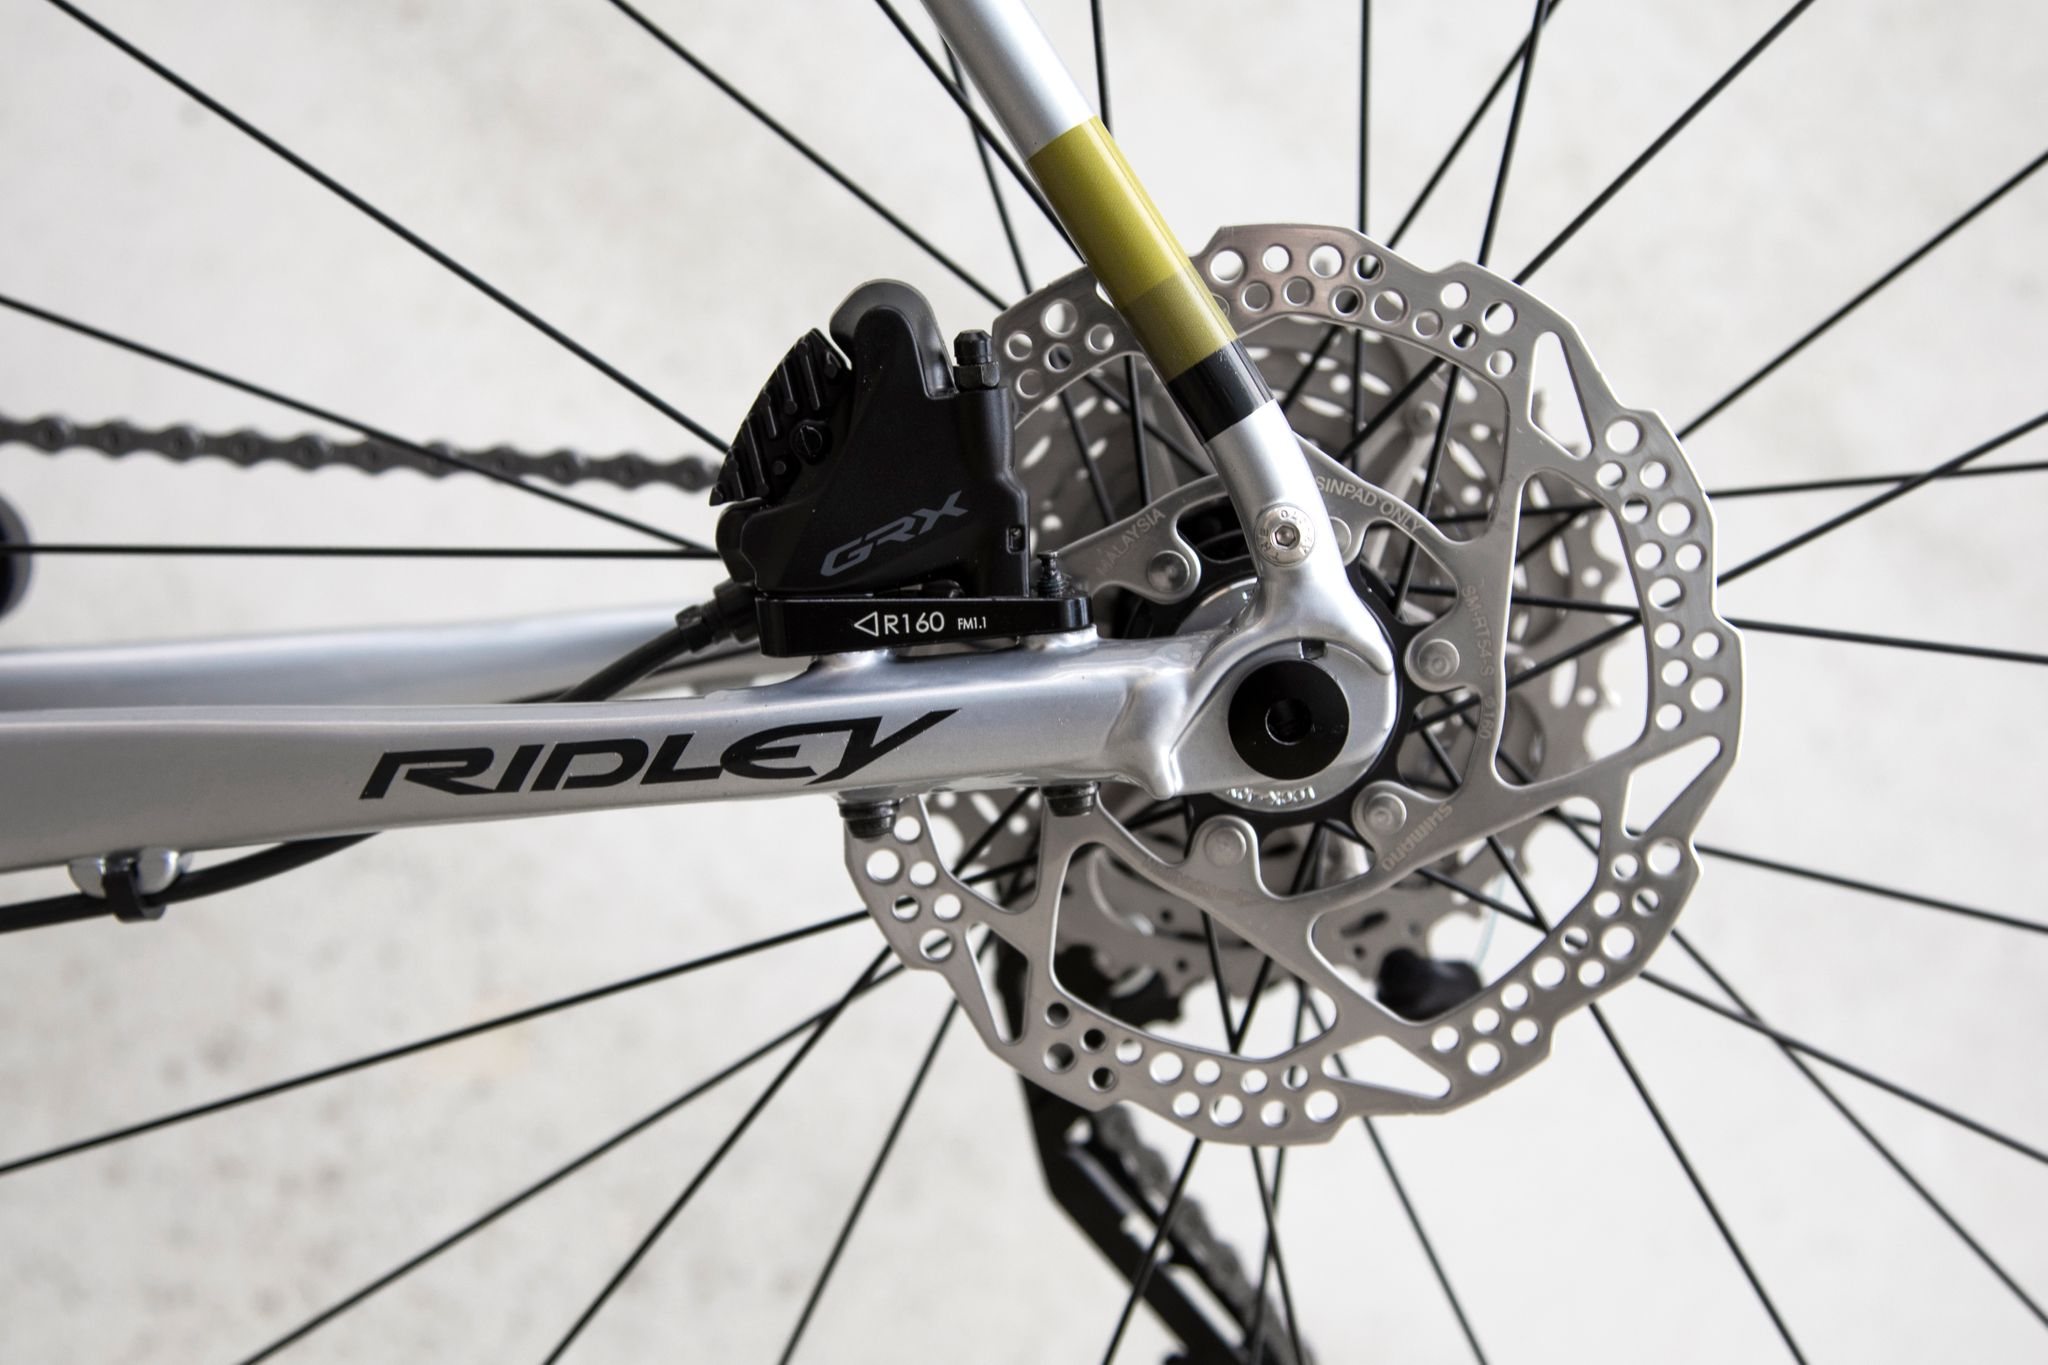 Ridley Kanzo A GRX 600 - Silver Powder Coating